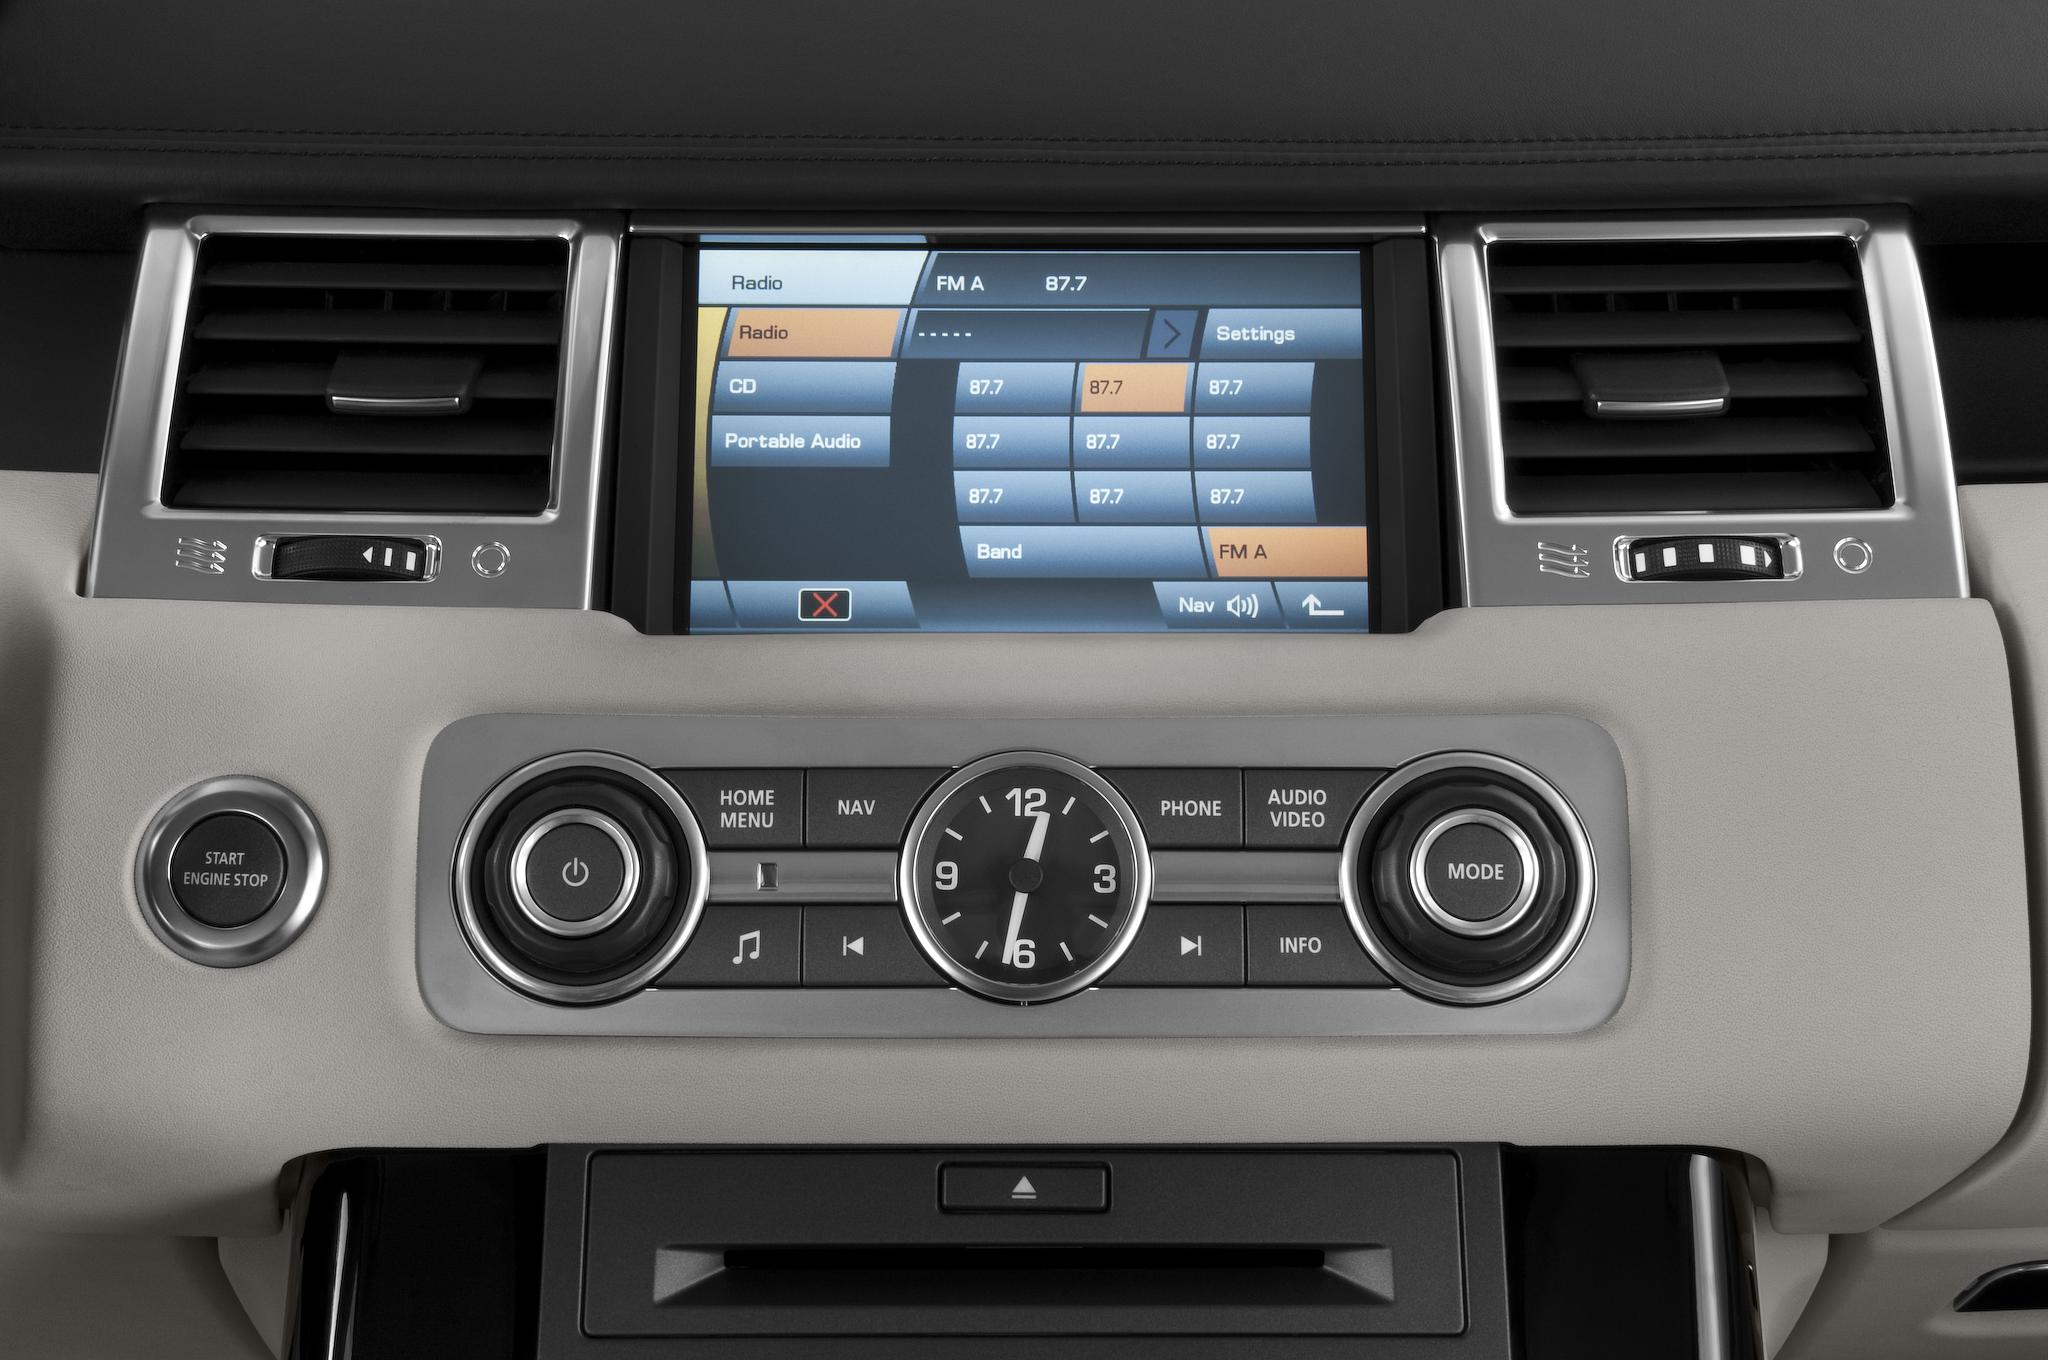 2011 Range Rover Sport - Editors' Notebook - Automobile Magazine